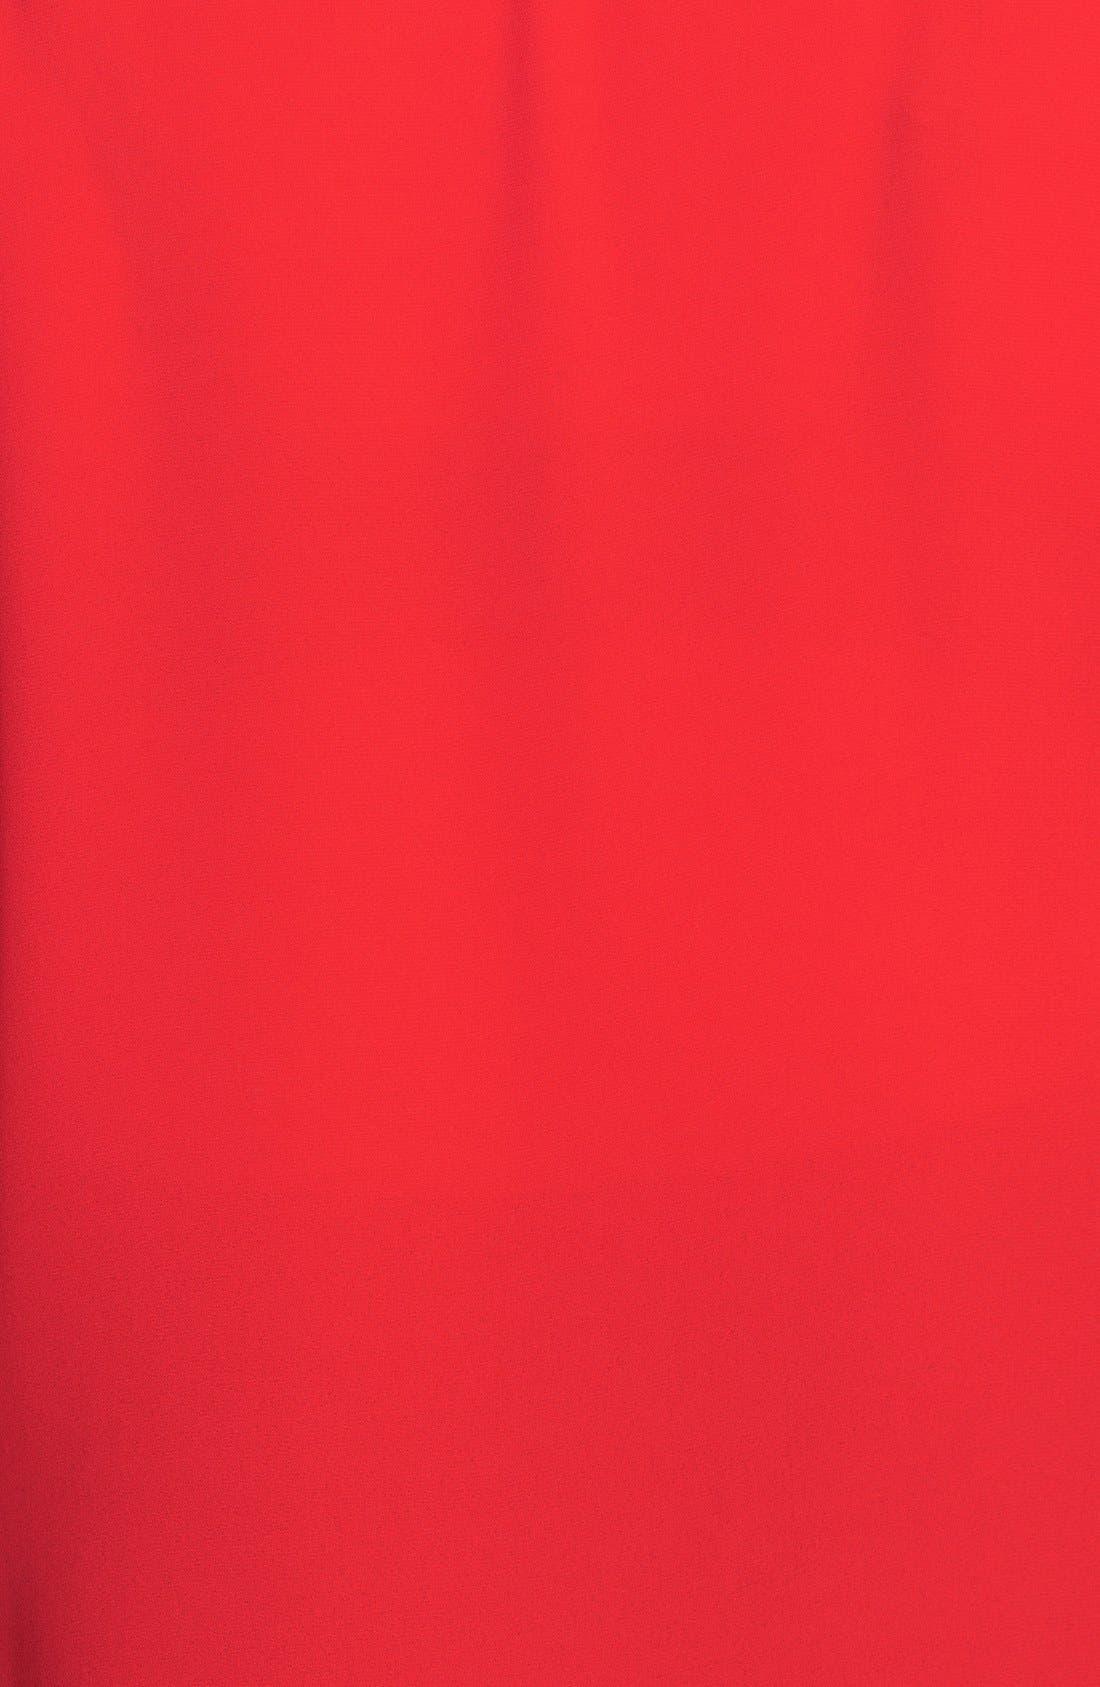 Alternate Image 3  - Vince Camuto Sleeveless Wrap Front Shirttail Blouse (Plus Size)